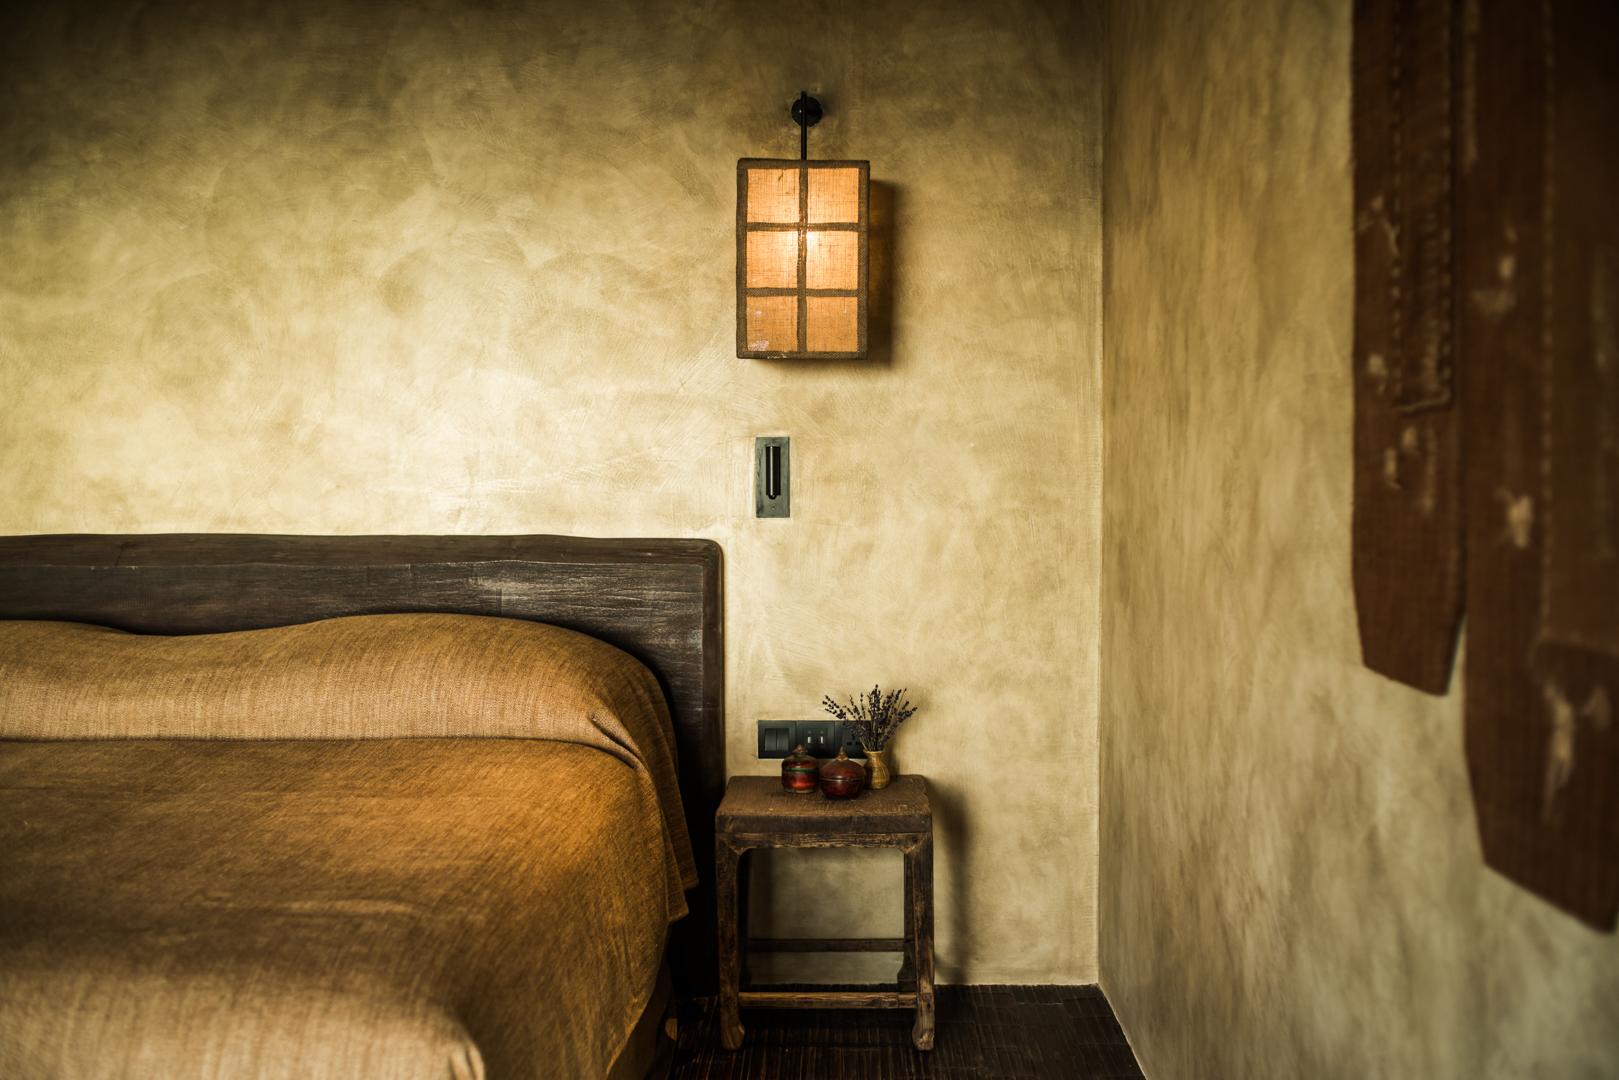 Zannier-Hotels-Bãi-San-Hô-Hill-Pool-Villa-6-©-Frederik-Wissink-for-Zannier-Hotels-1